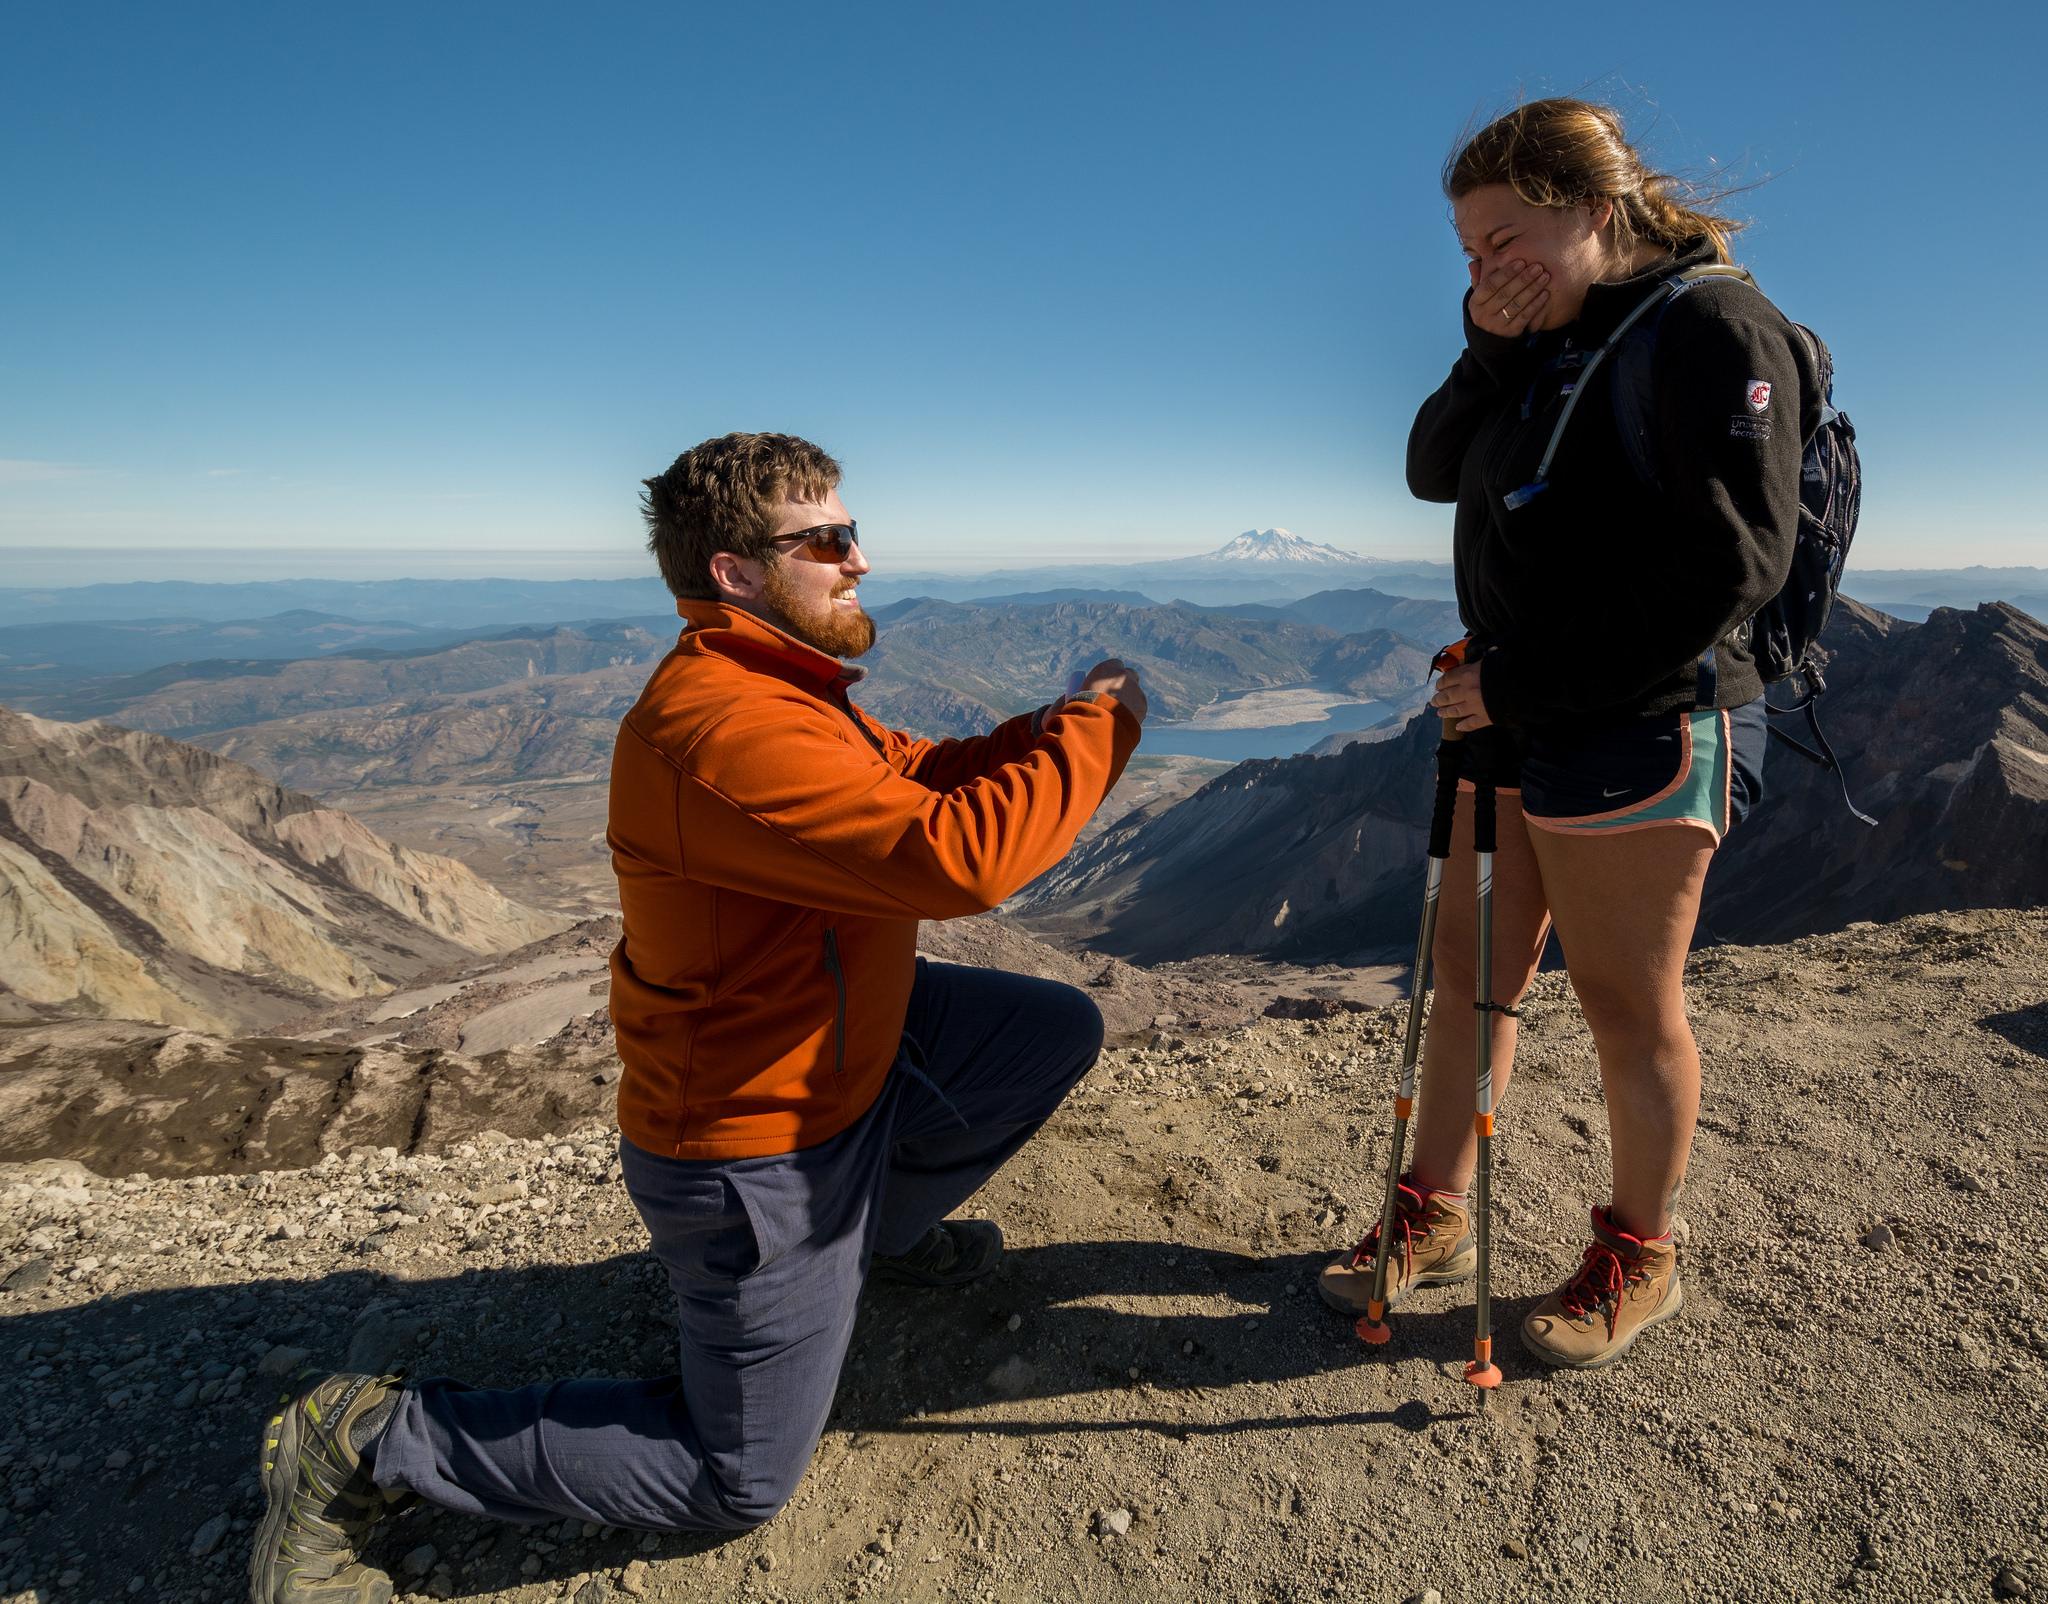 Peak proposal Mount St Helens by Keith LaPlante